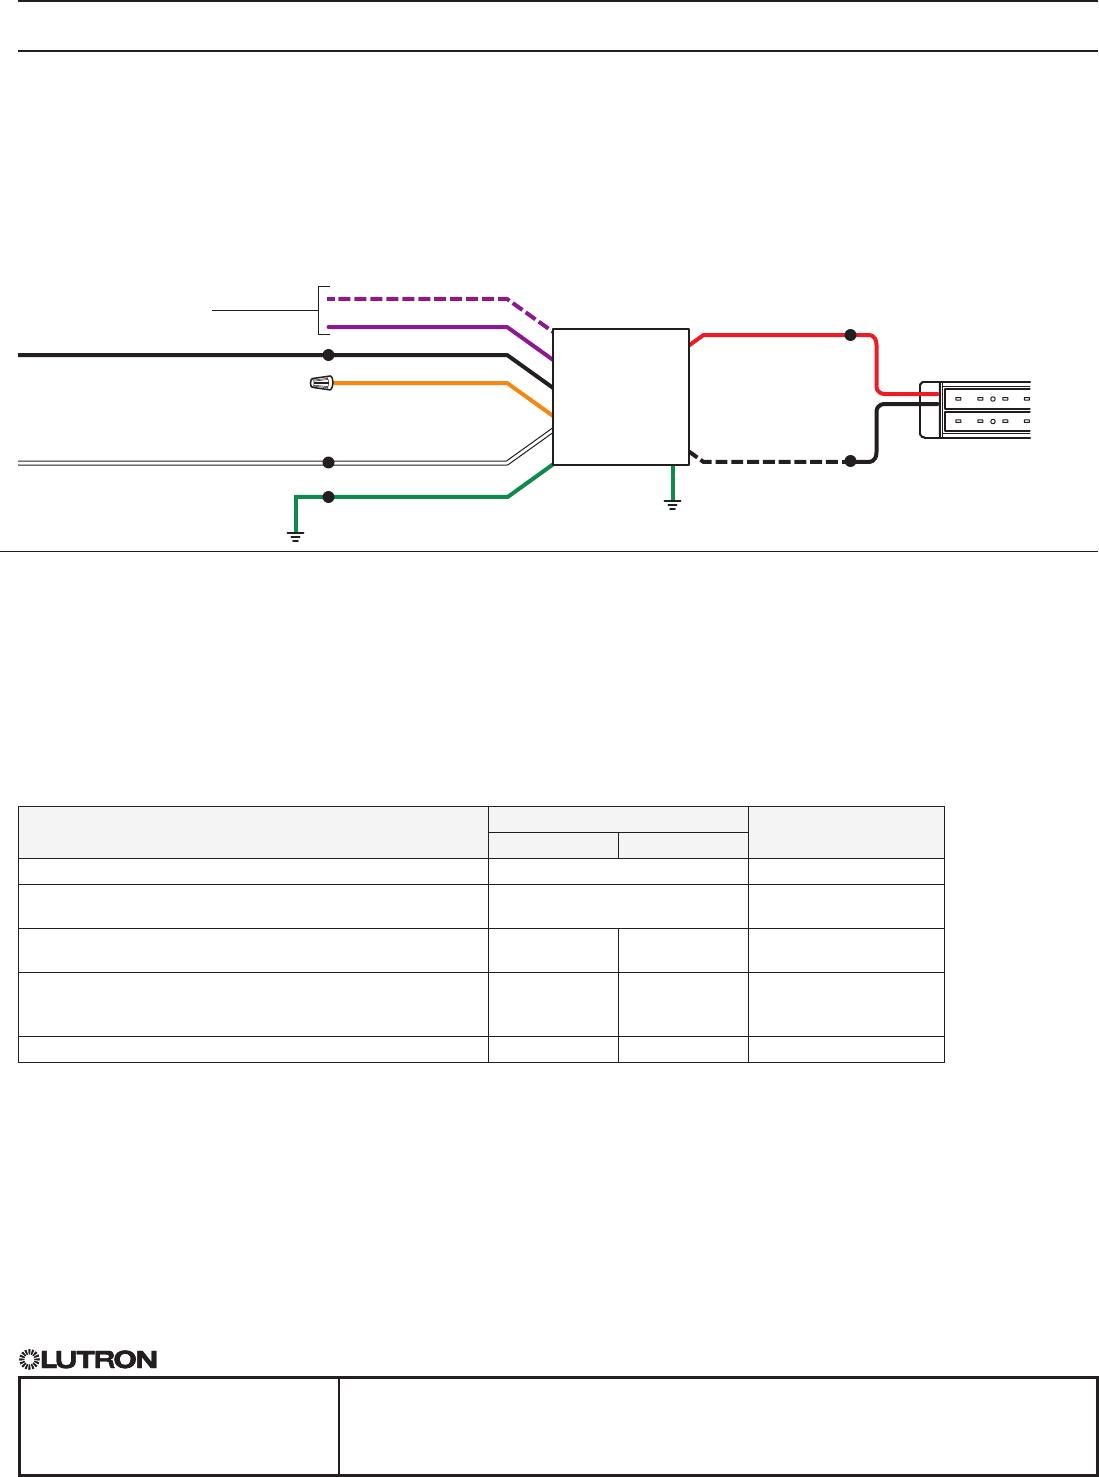 Energi Savr Node Qs Warranty Graphix Lutron Wiring Diagram Hi Lume A Series Constant Voltage Driver Ul Listed